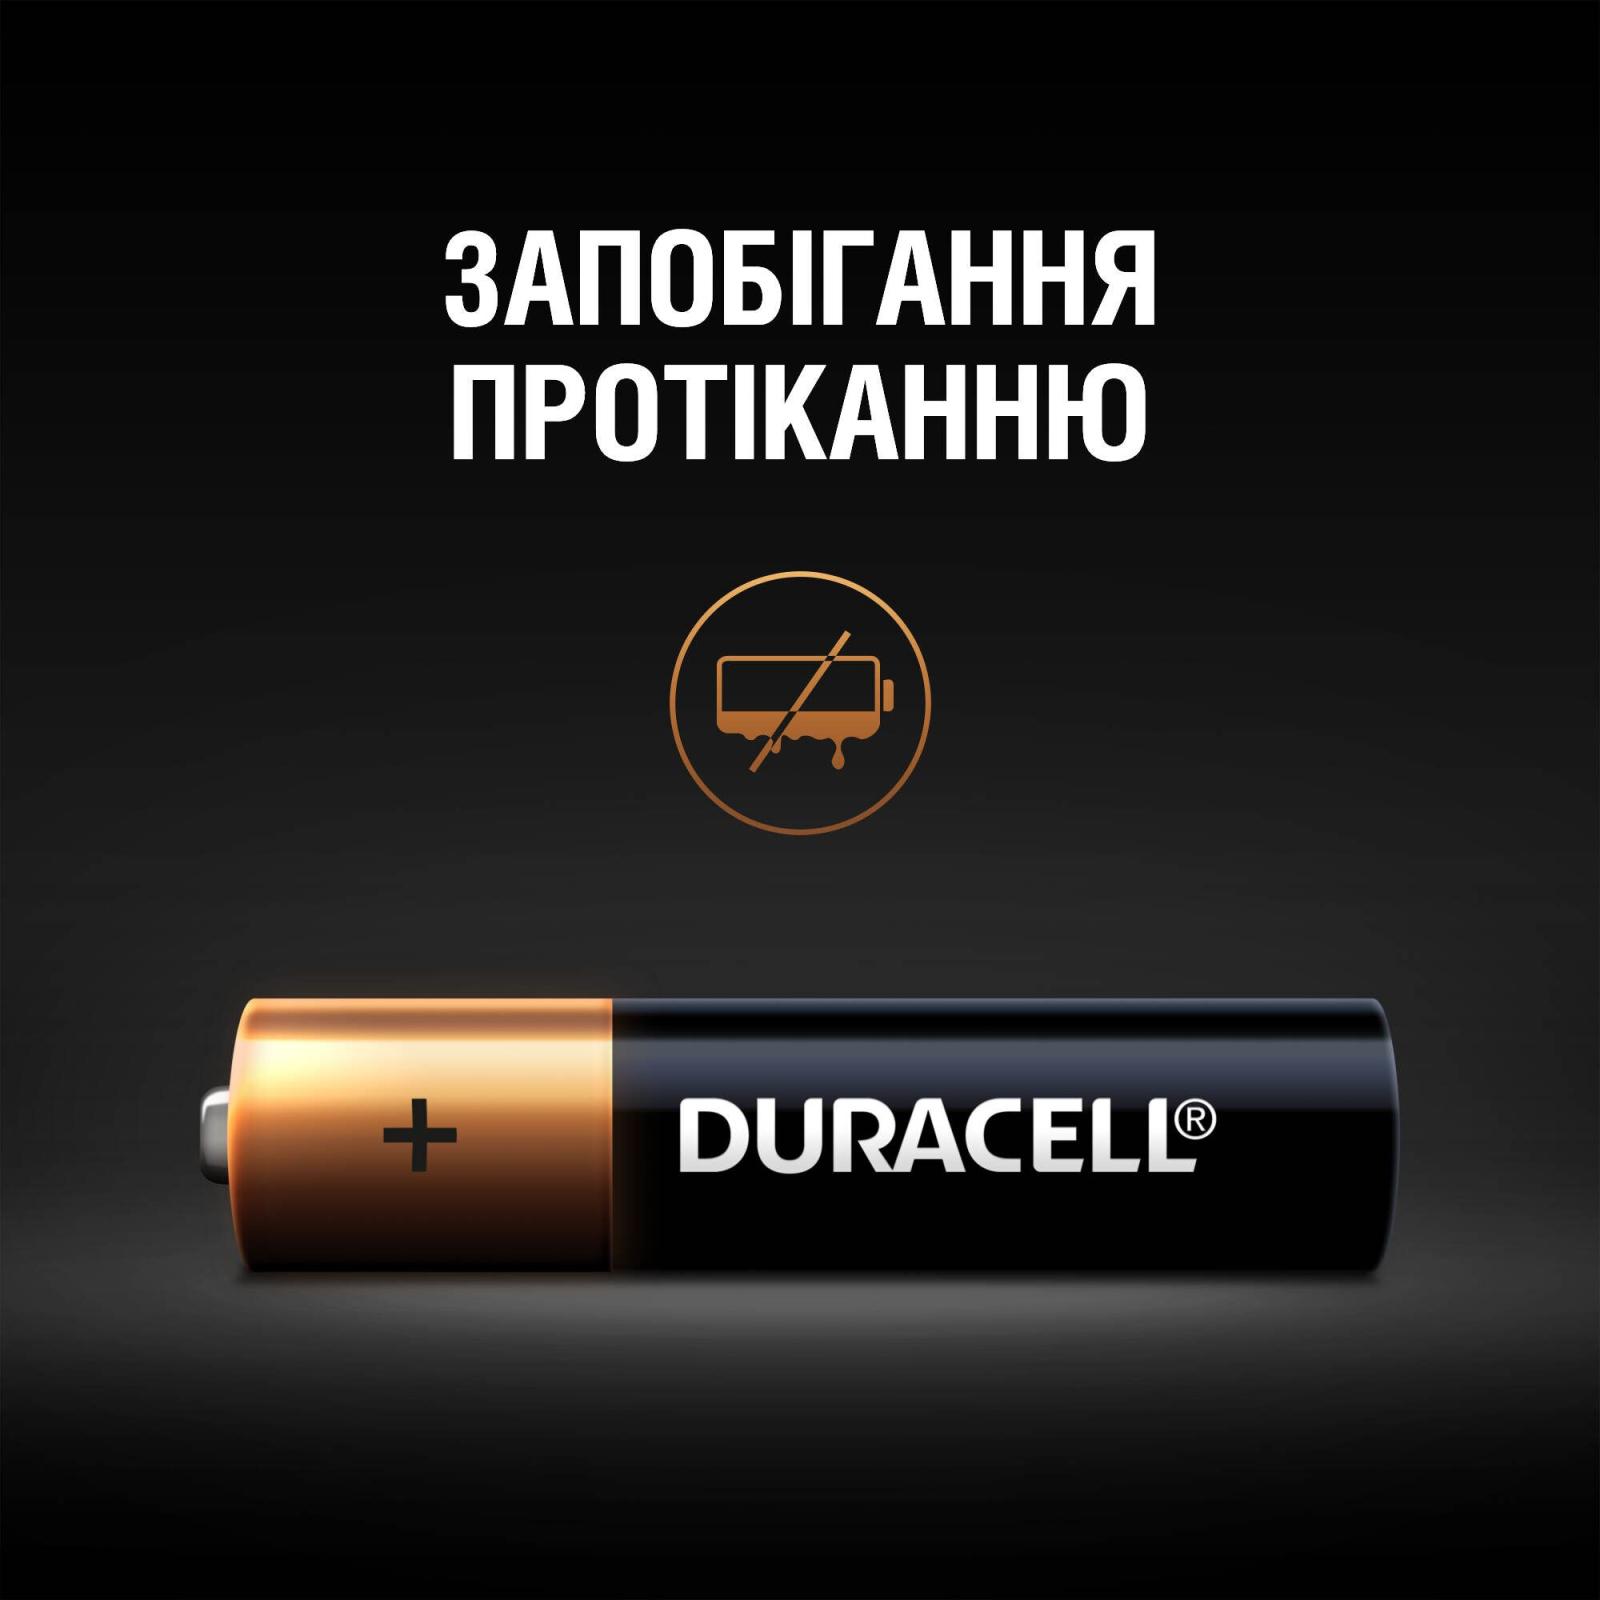 Батарейка Duracell AAA MN2400 LR03 * 8 (5000394203341 / 81480364) изображение 6